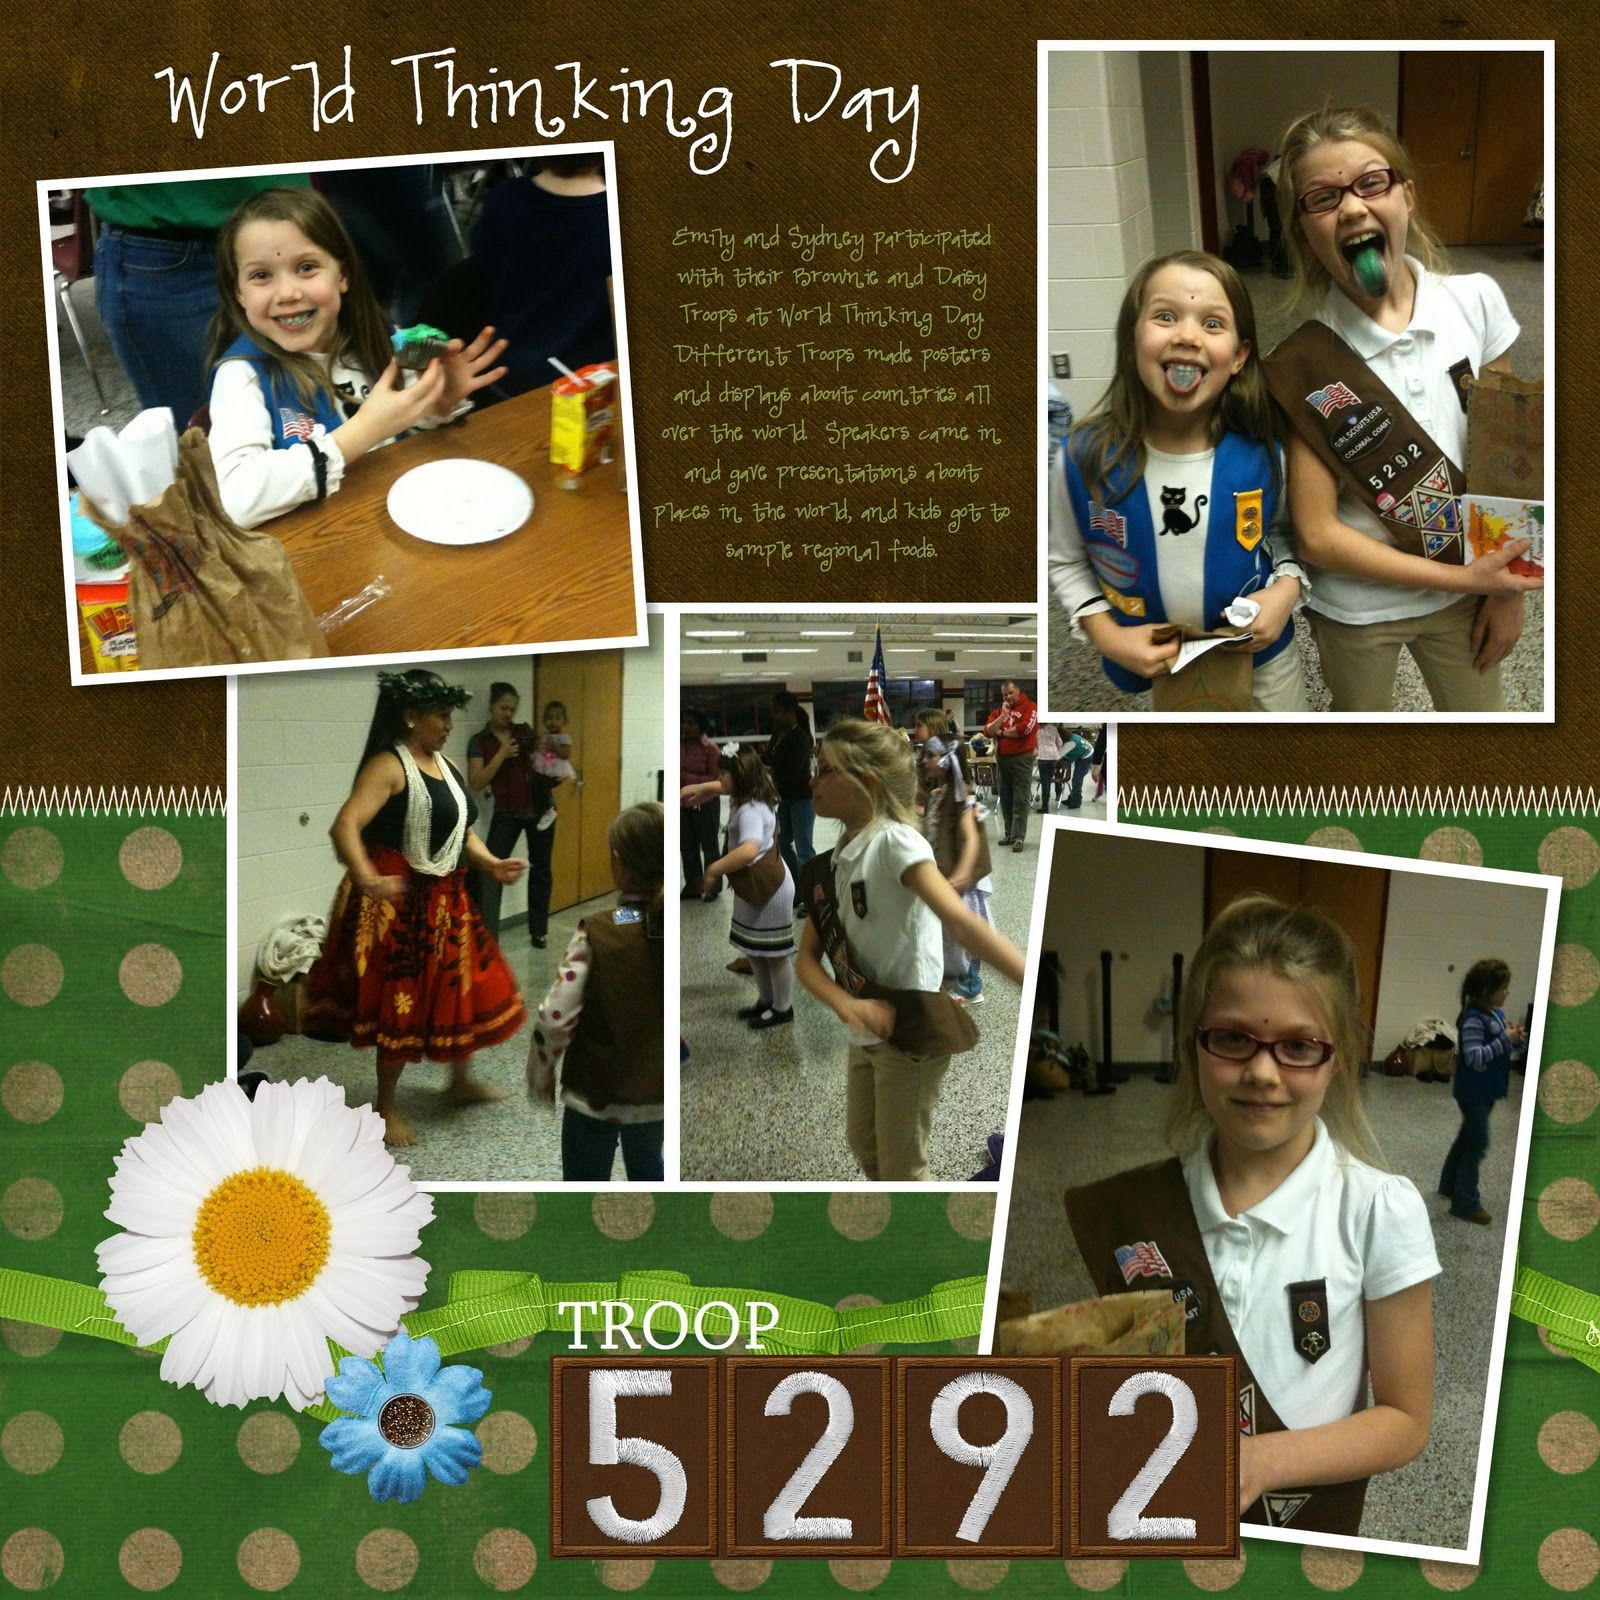 Girl scout scrapbook ideas - Girl Scout Scrapbook Ideas Google Search